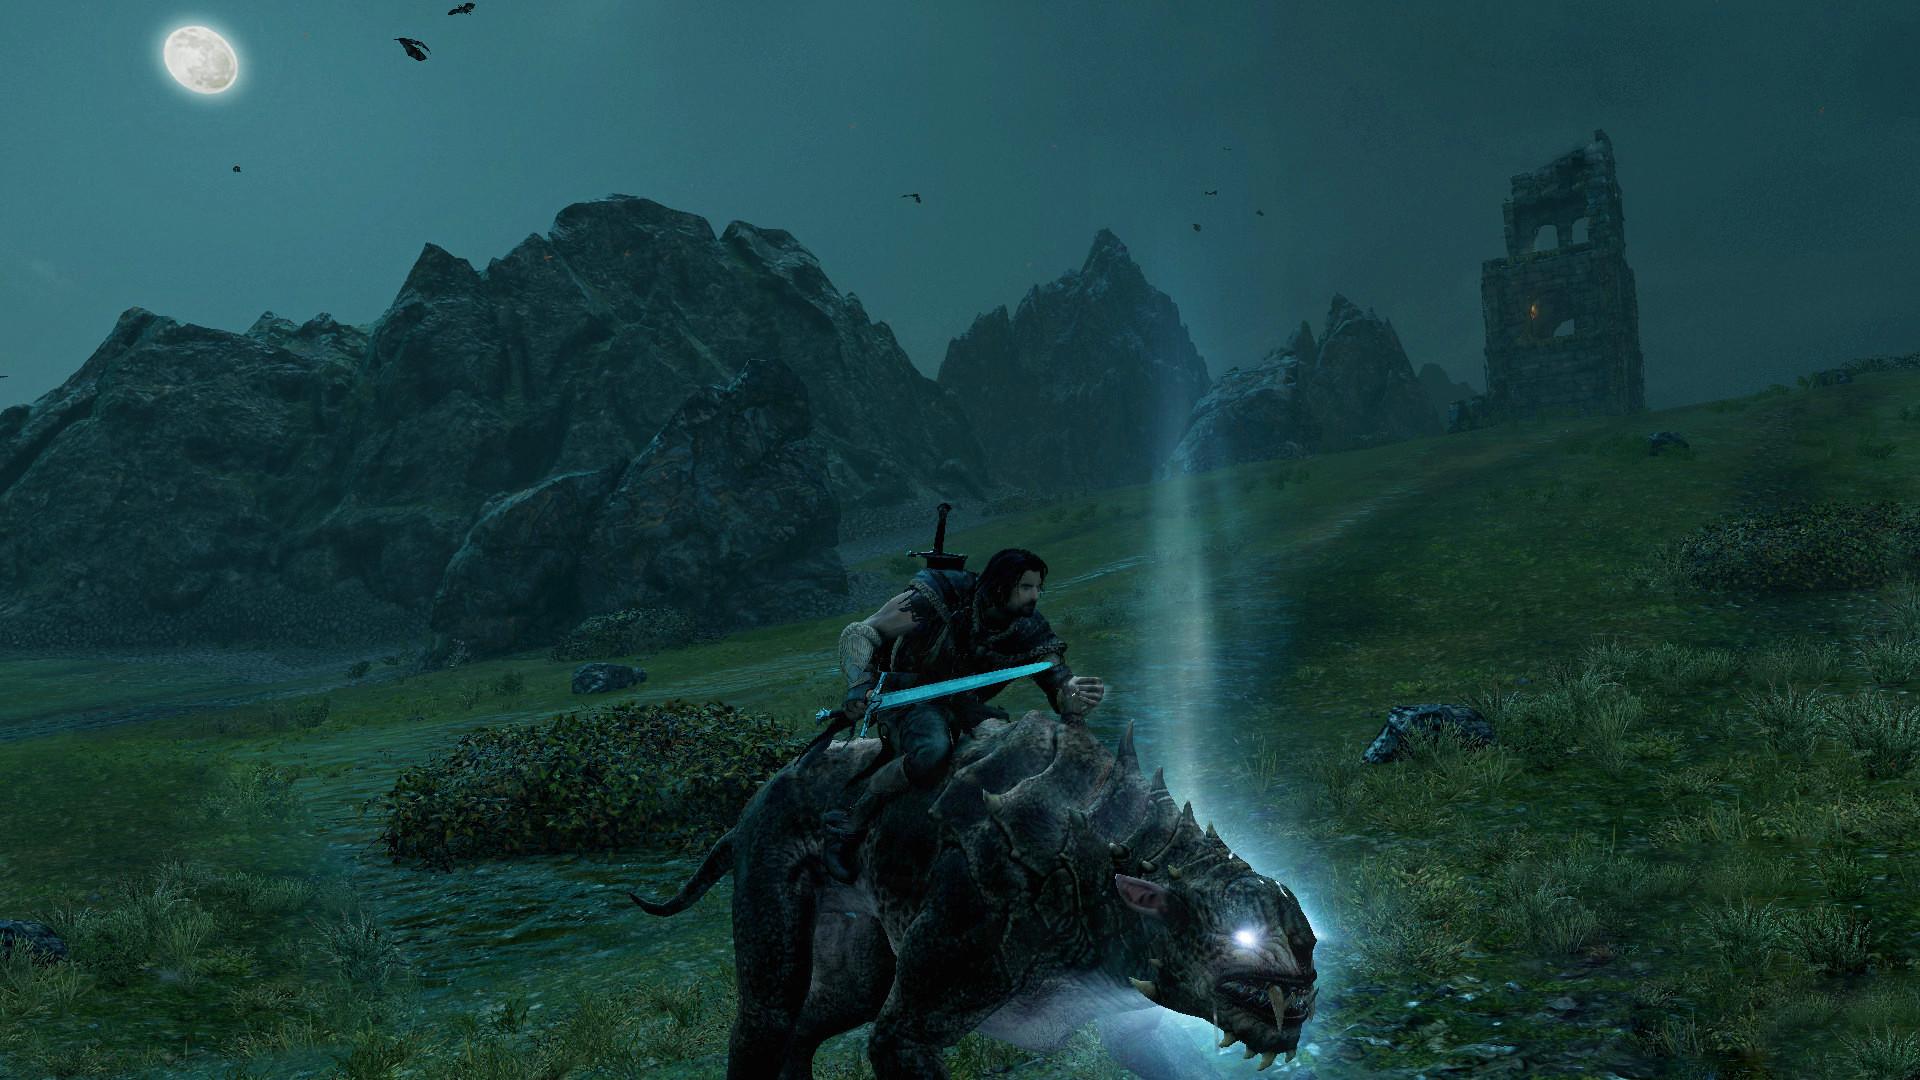 ShadowOfMordor 2016-10-17 20-22-18-54.jpg - Middle-earth: Shadow of Mordor